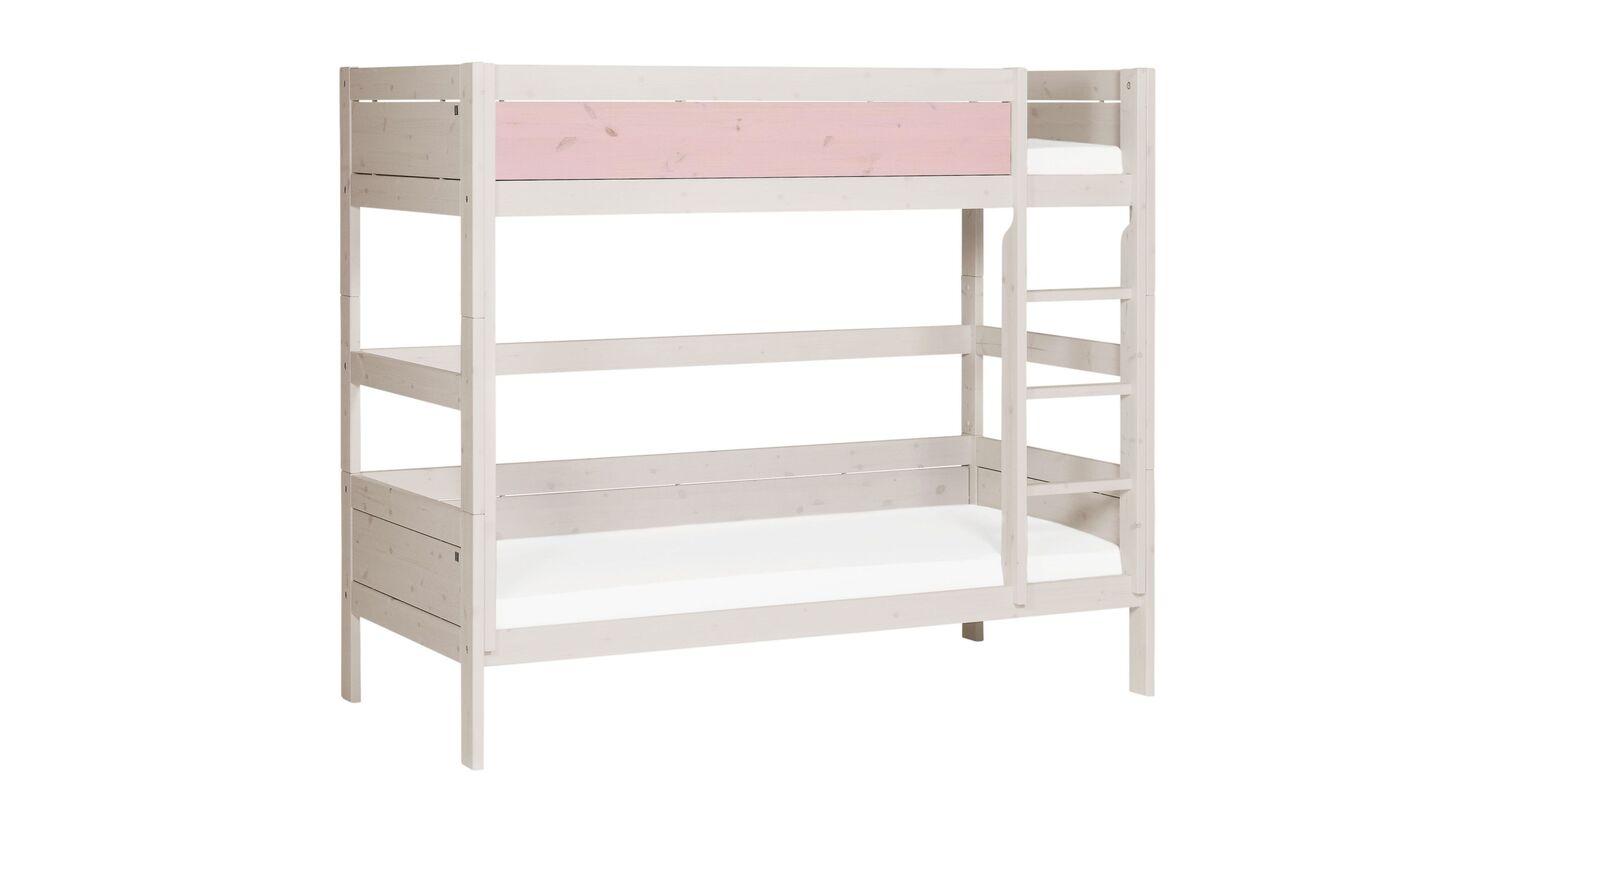 LIFETIME Etagenbett Color mit rosa Front für Mädchen